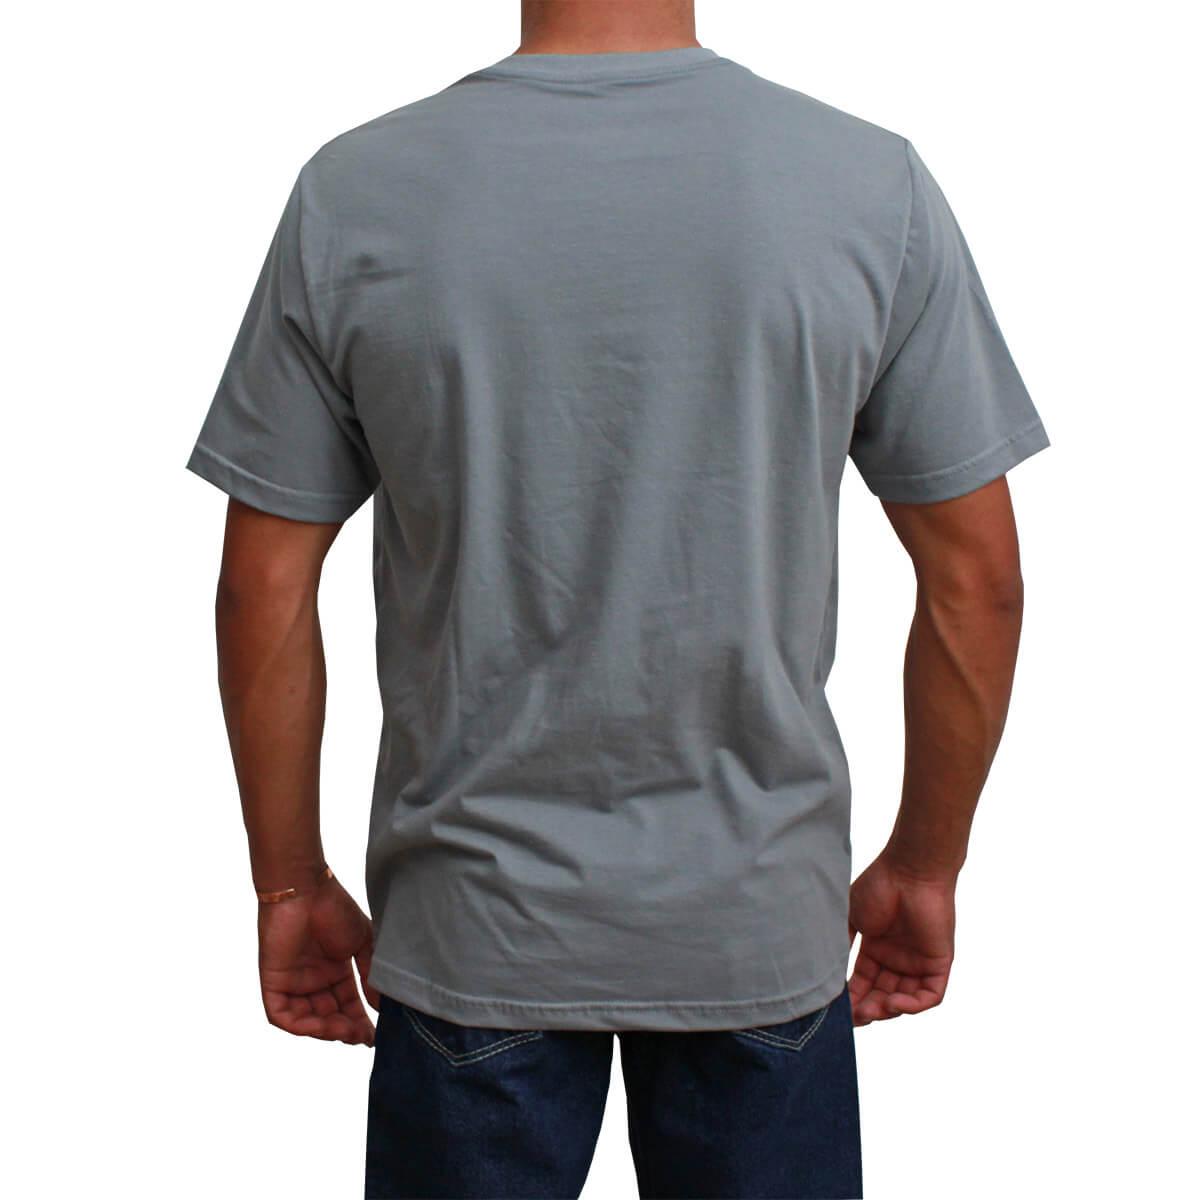 Camiseta Masculina Smith Brothers Cinza